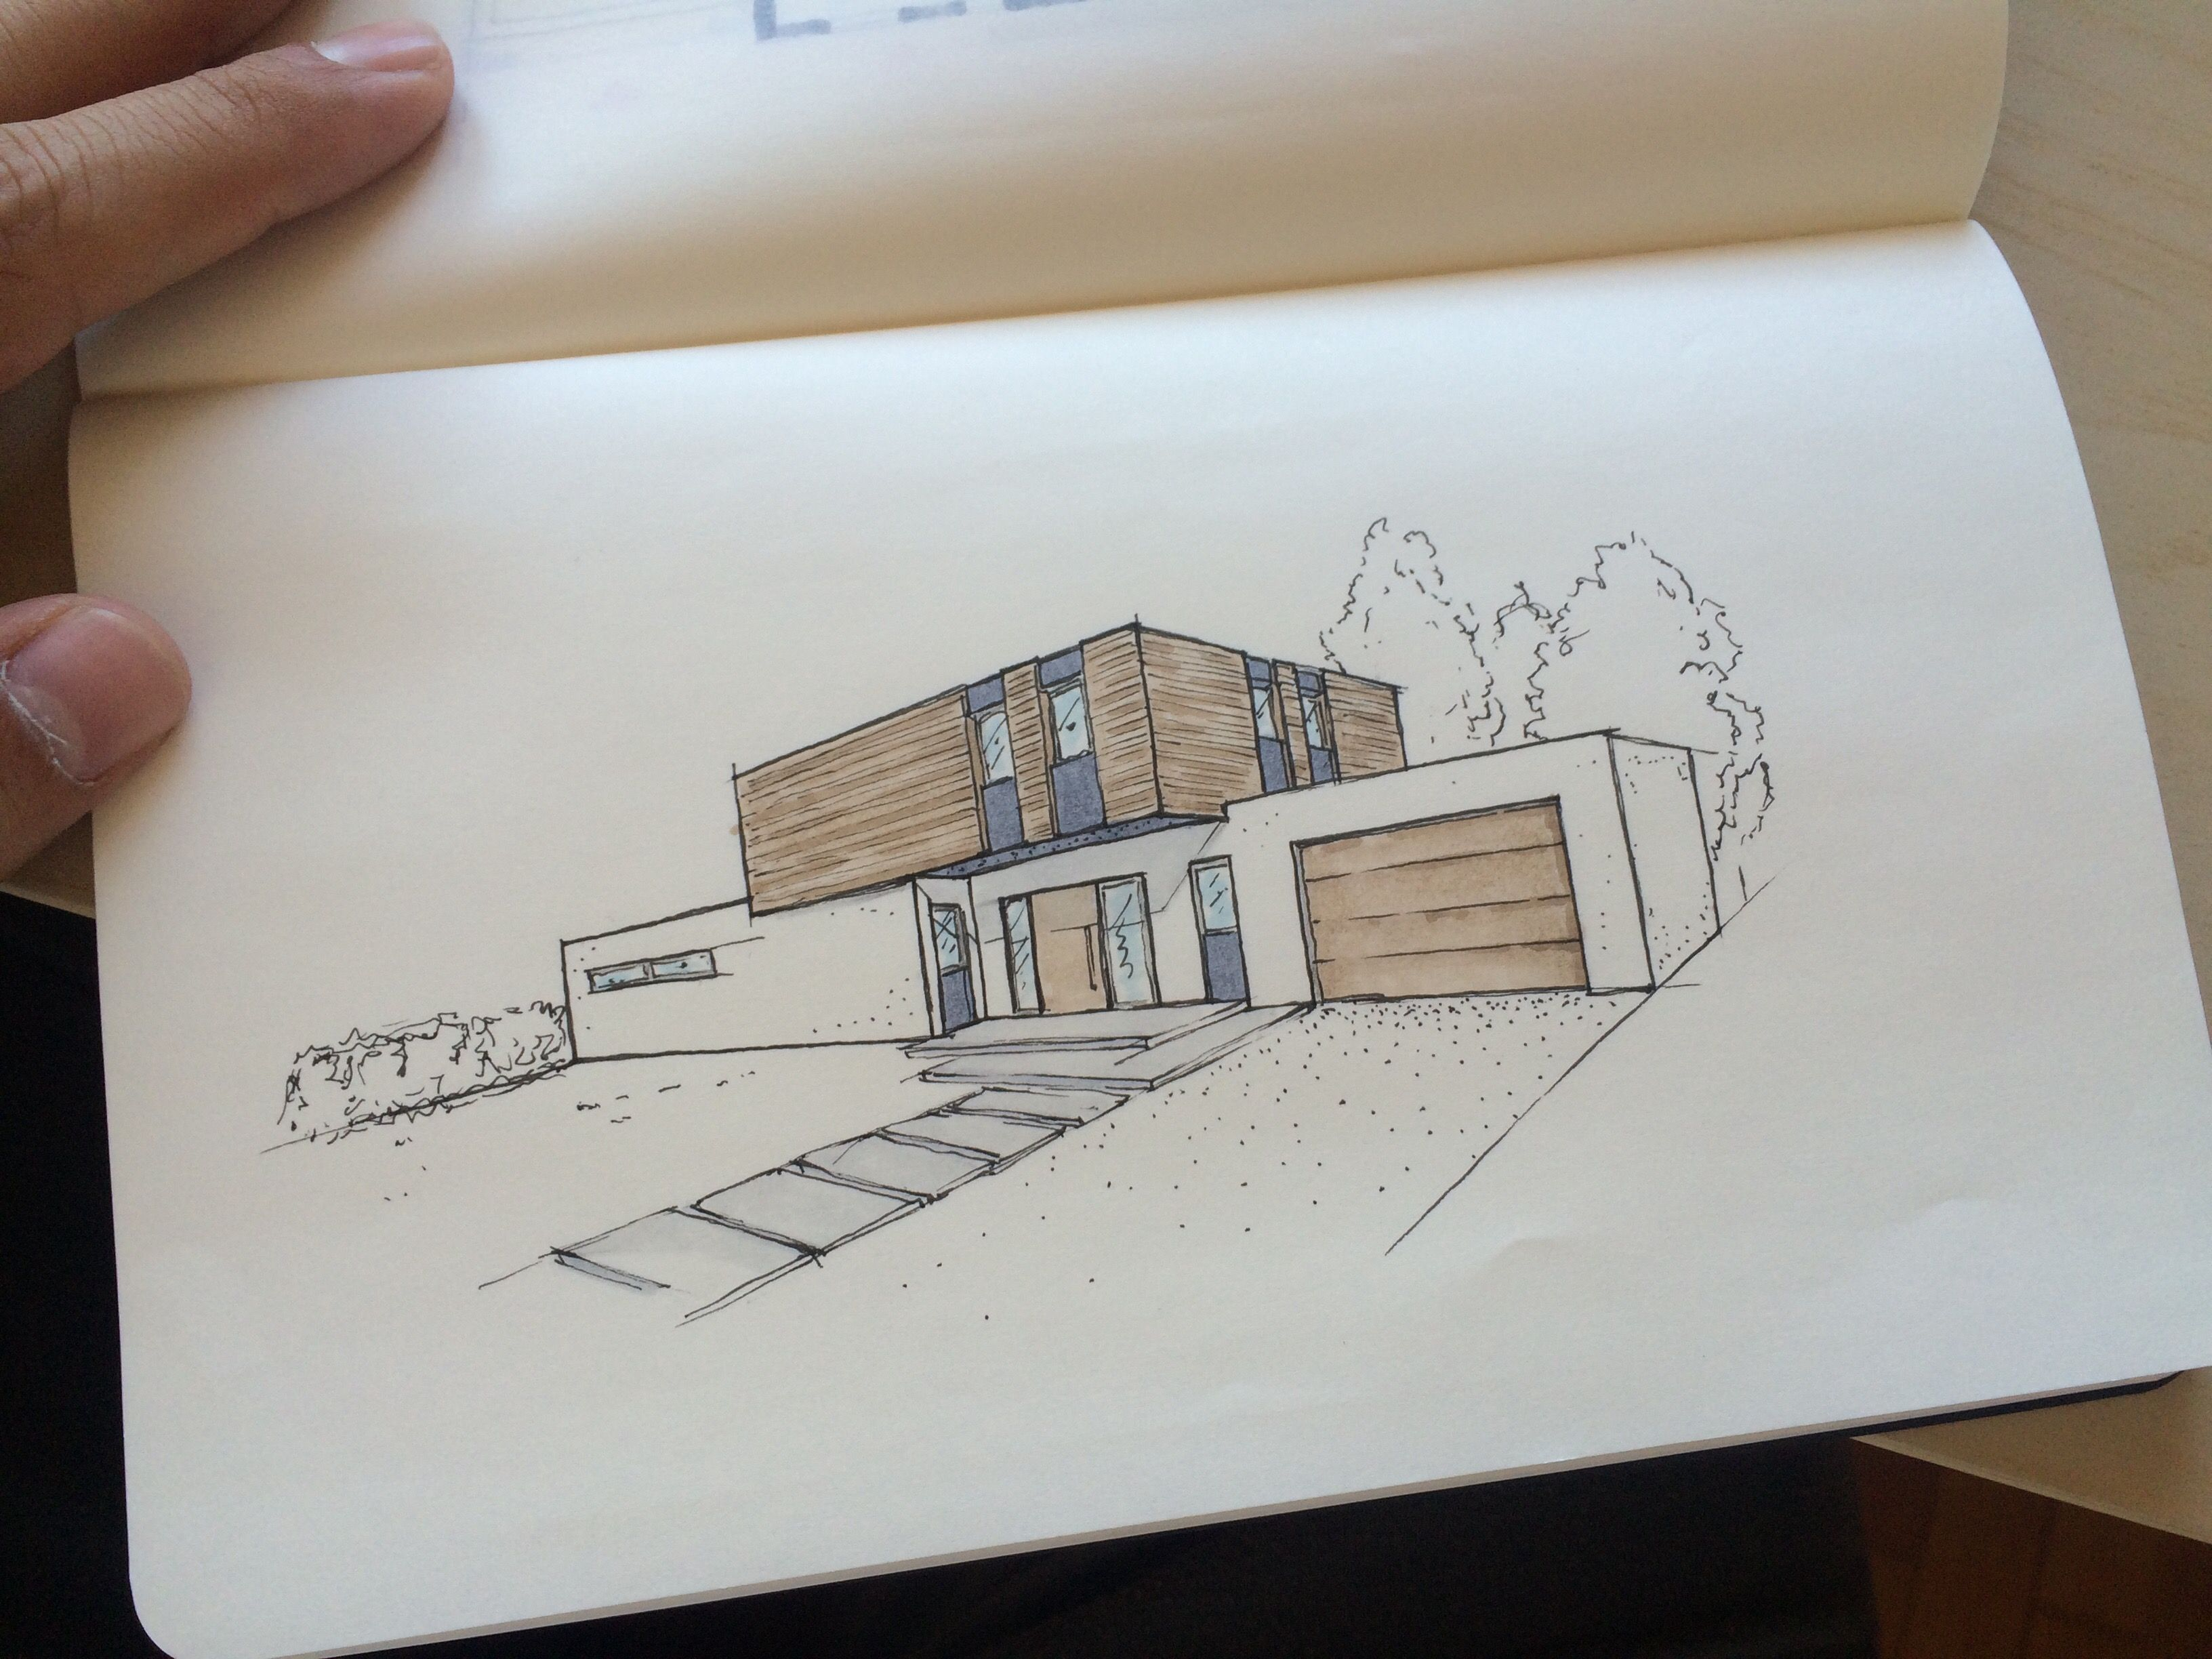 Design architektur architecture einfamilienhaus home house sketch skizze copic marker perspektive entwurf new dominic mimlich